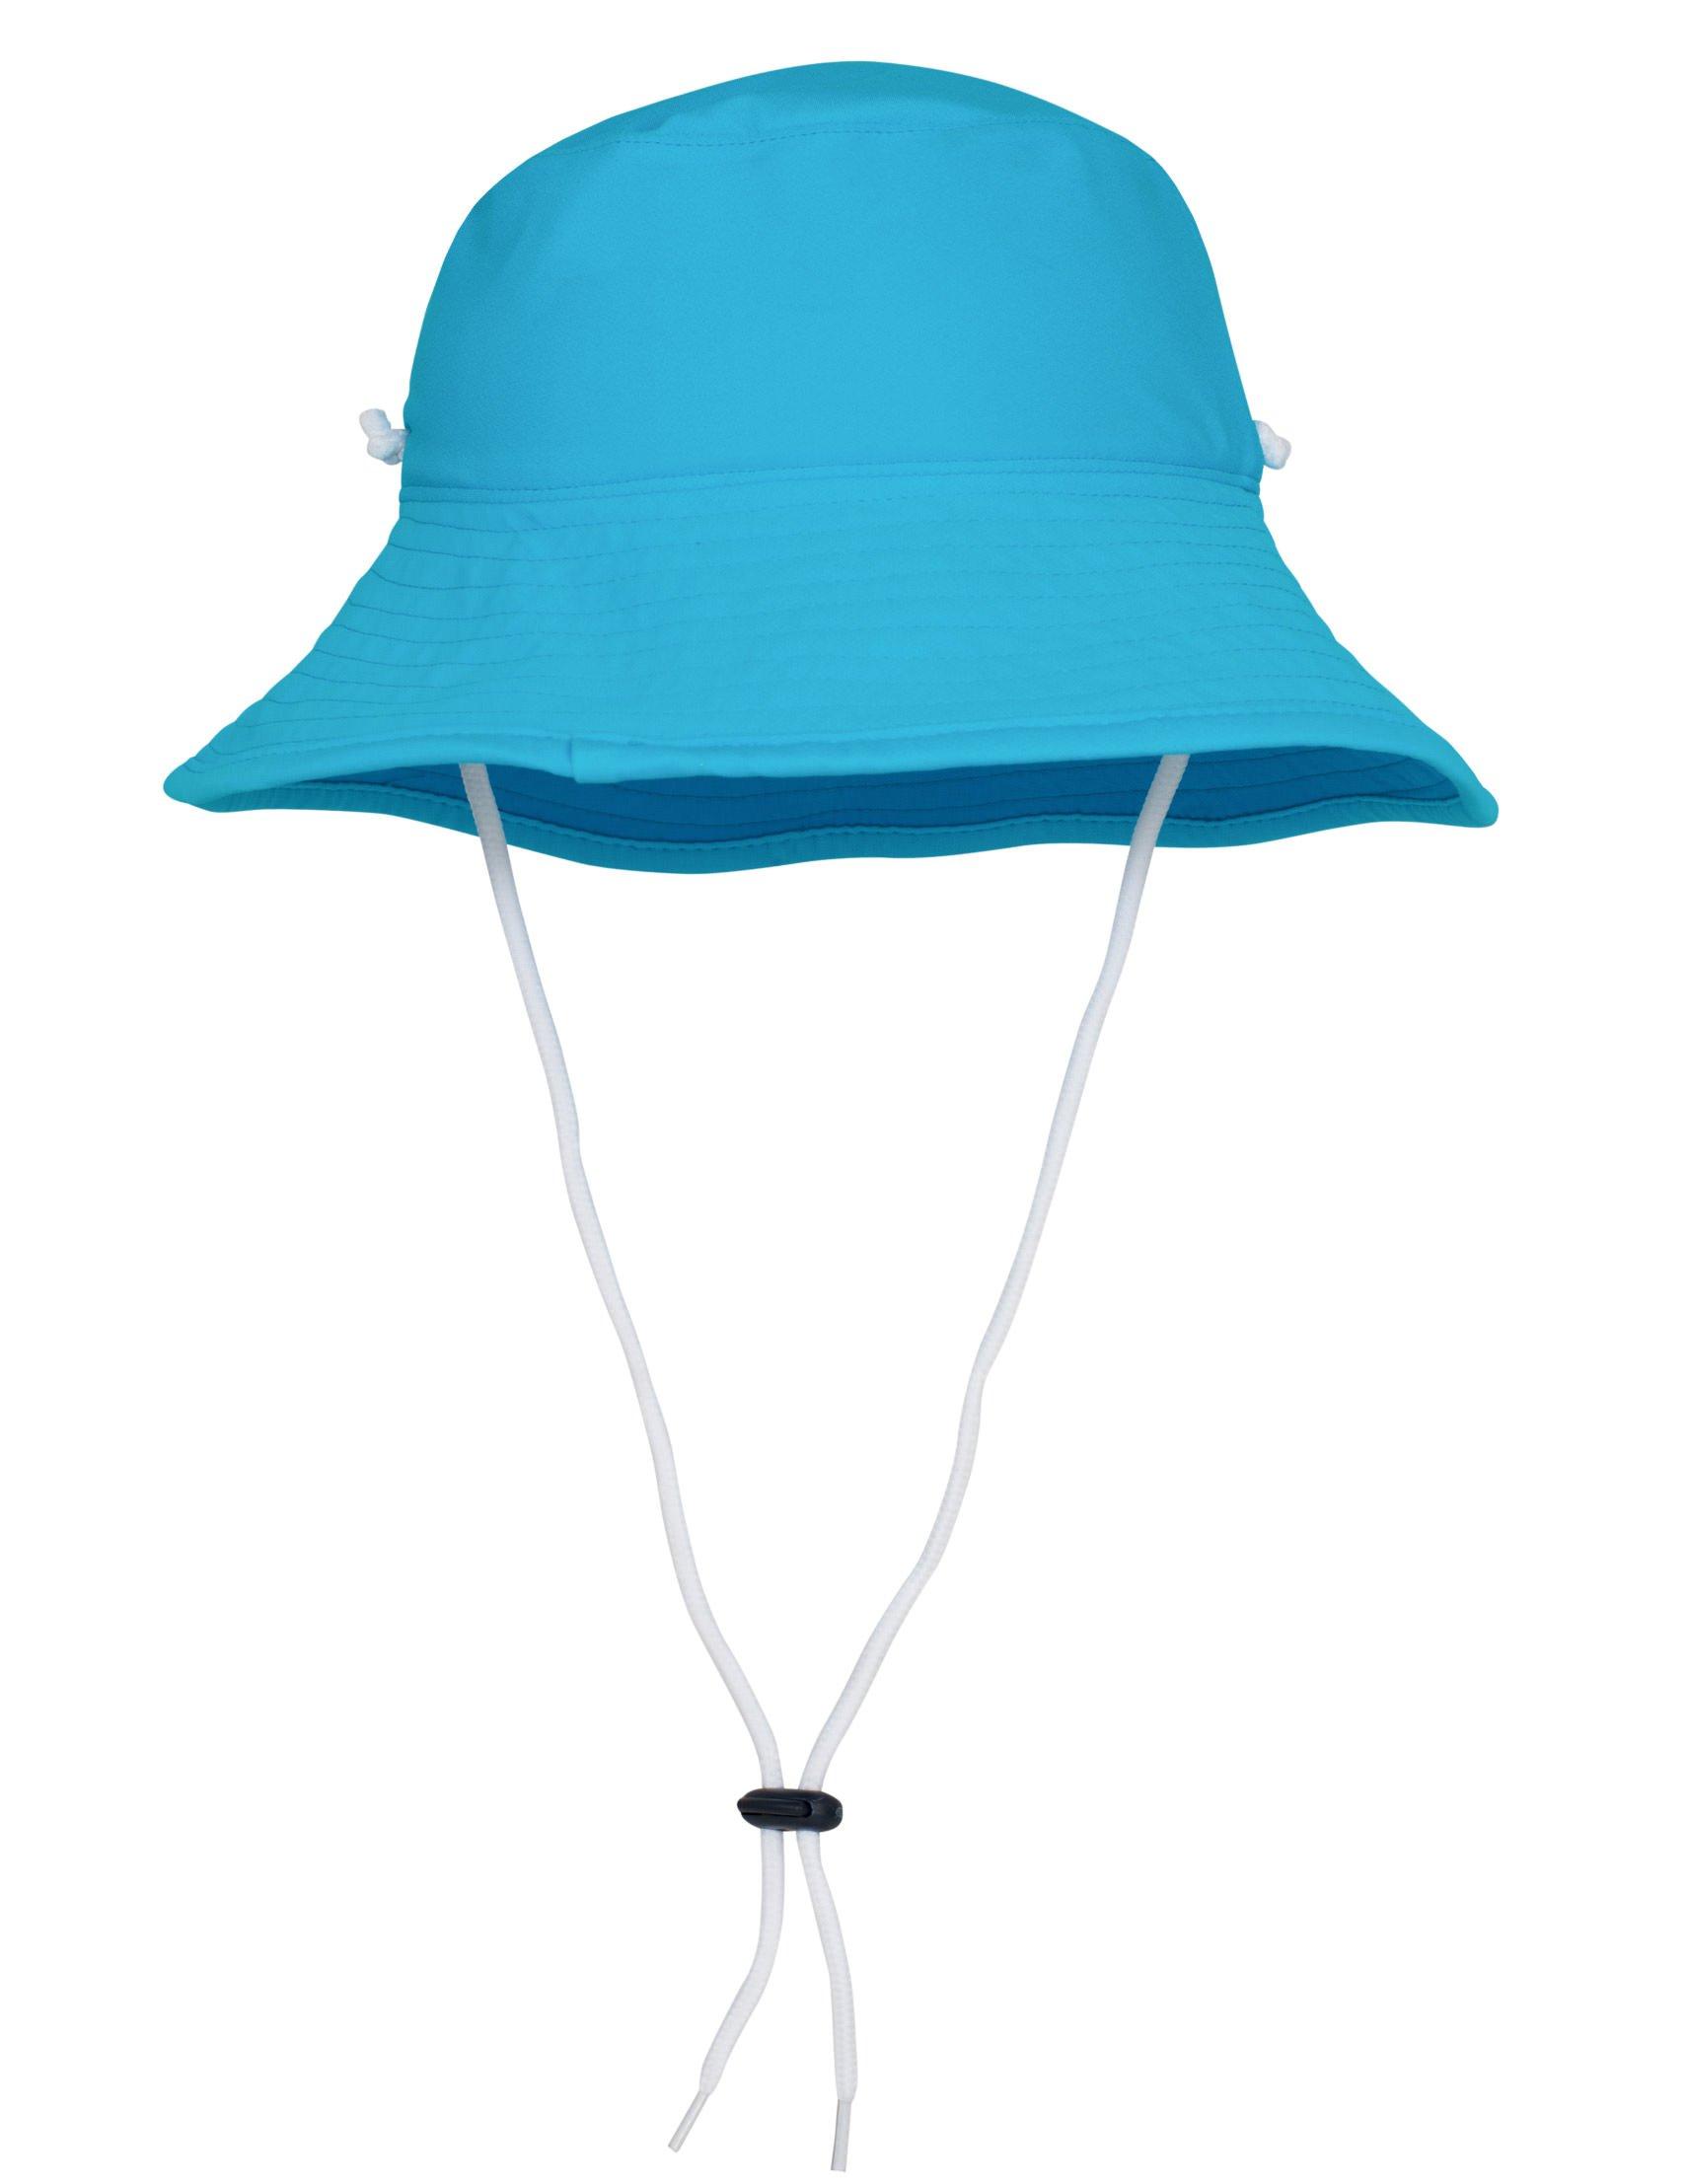 Tuga Girls Bucket Hat (UPF 50+), Turquoise/Hawaii, Medium